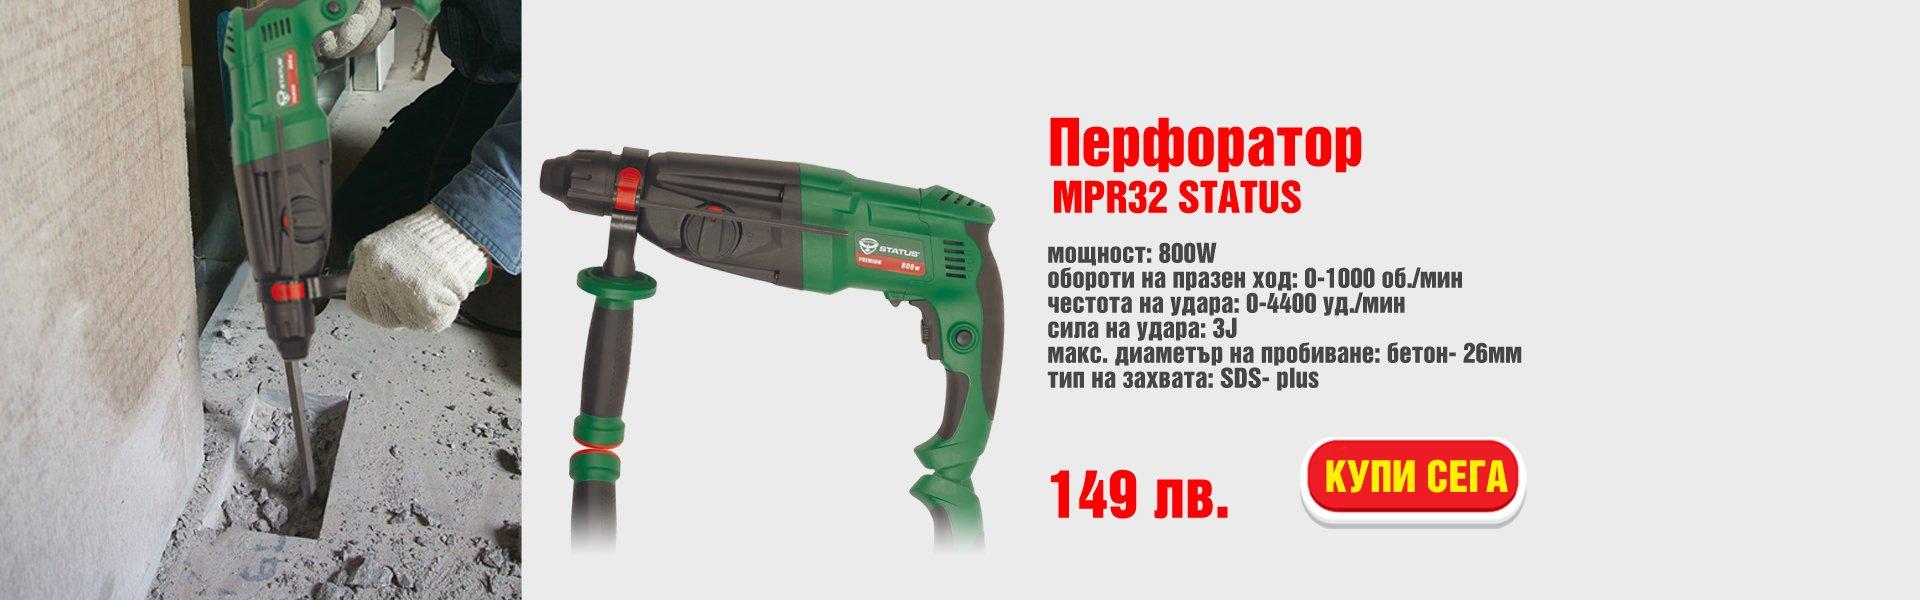 Перфоратор MPR32 STATUS